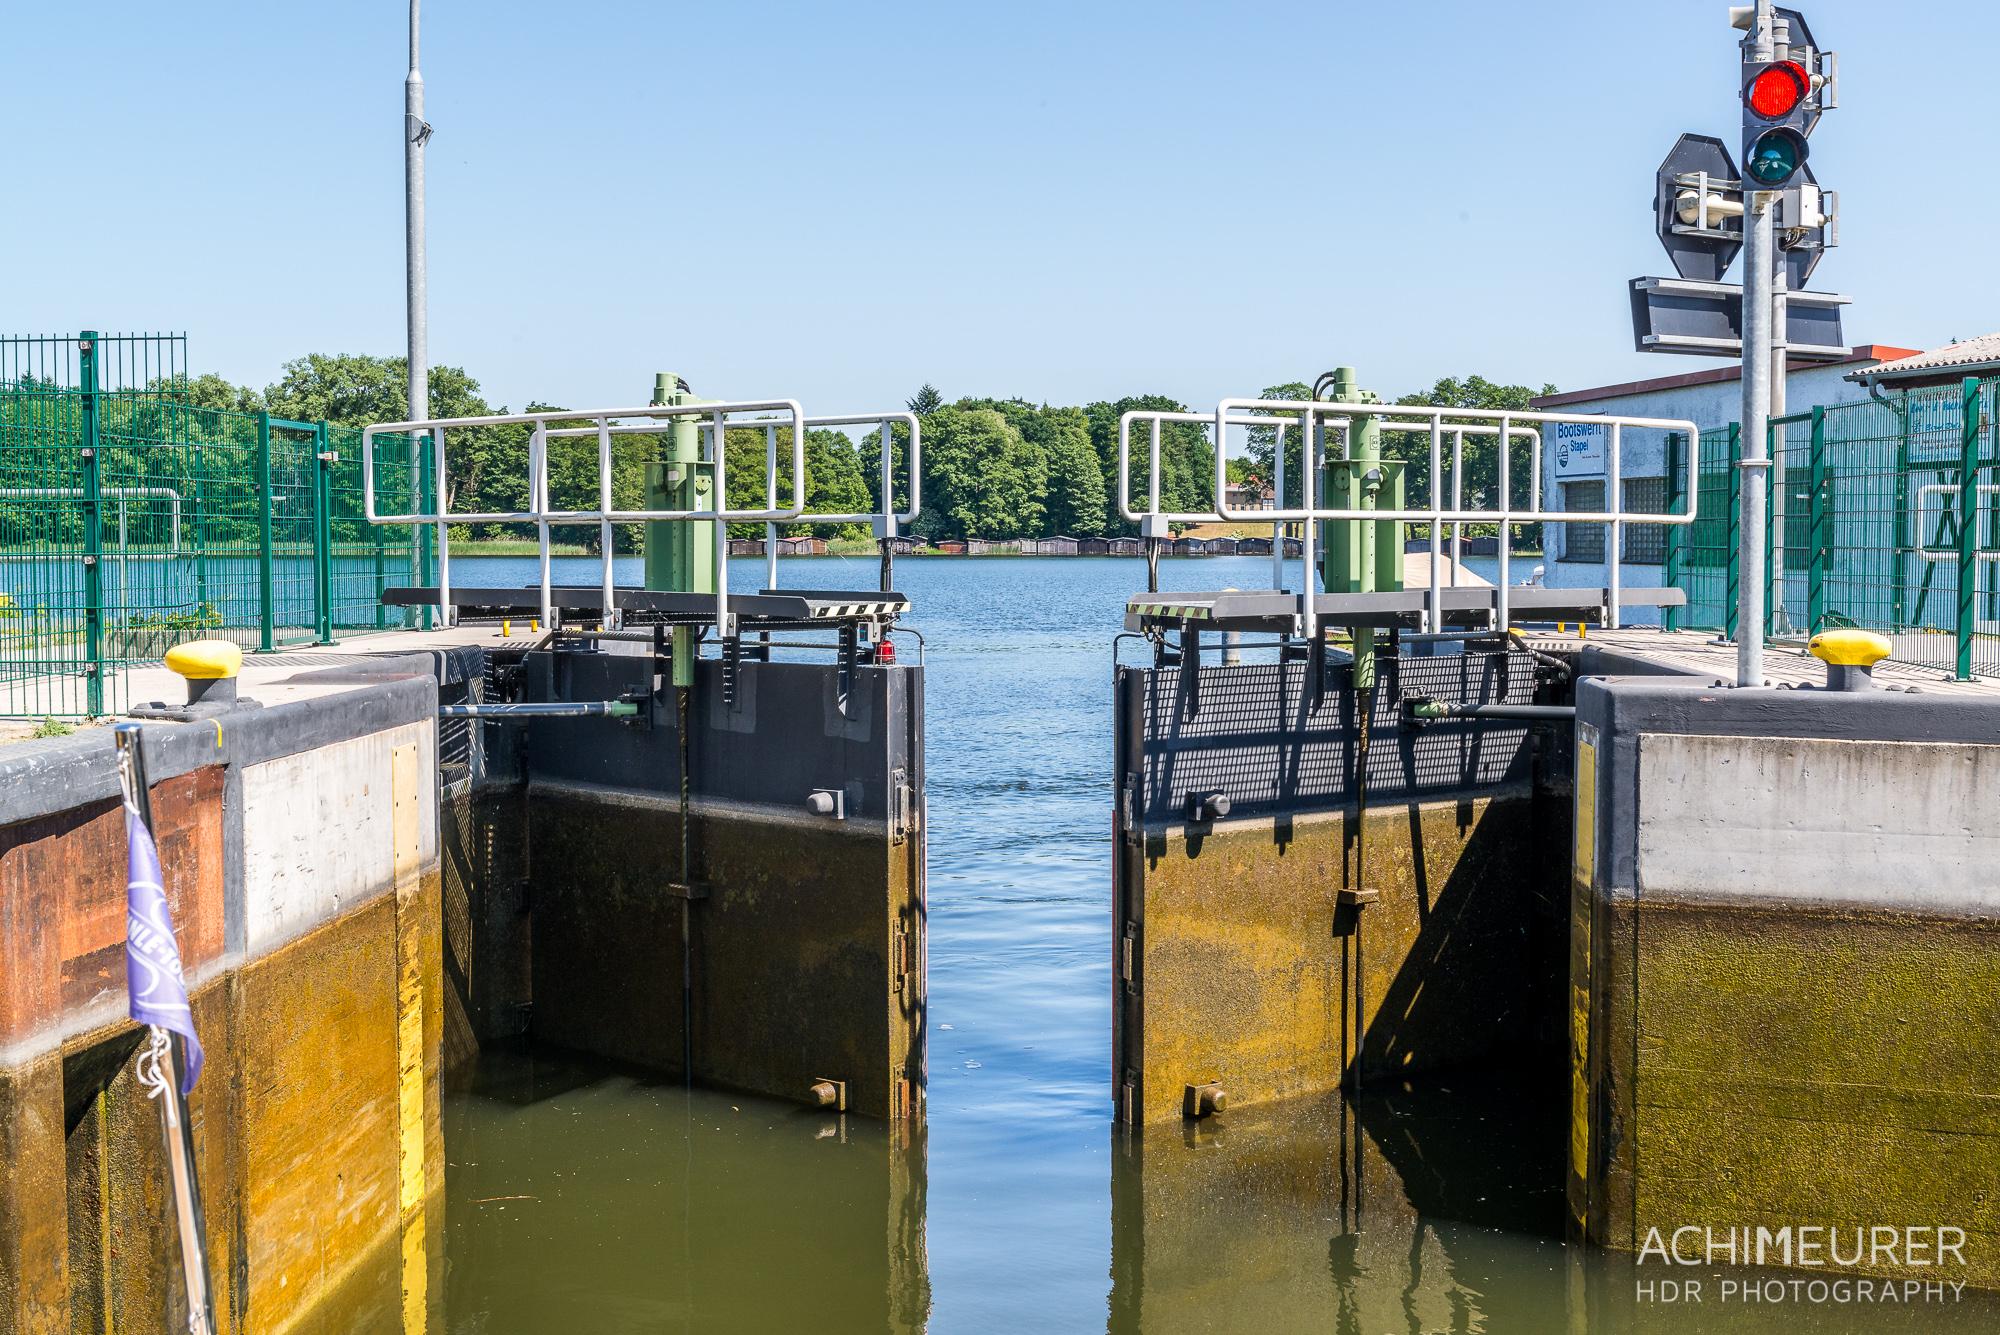 Hausboot-Kuhnle-Mueritz-Mecklenburg-Vorpommern-See_3202